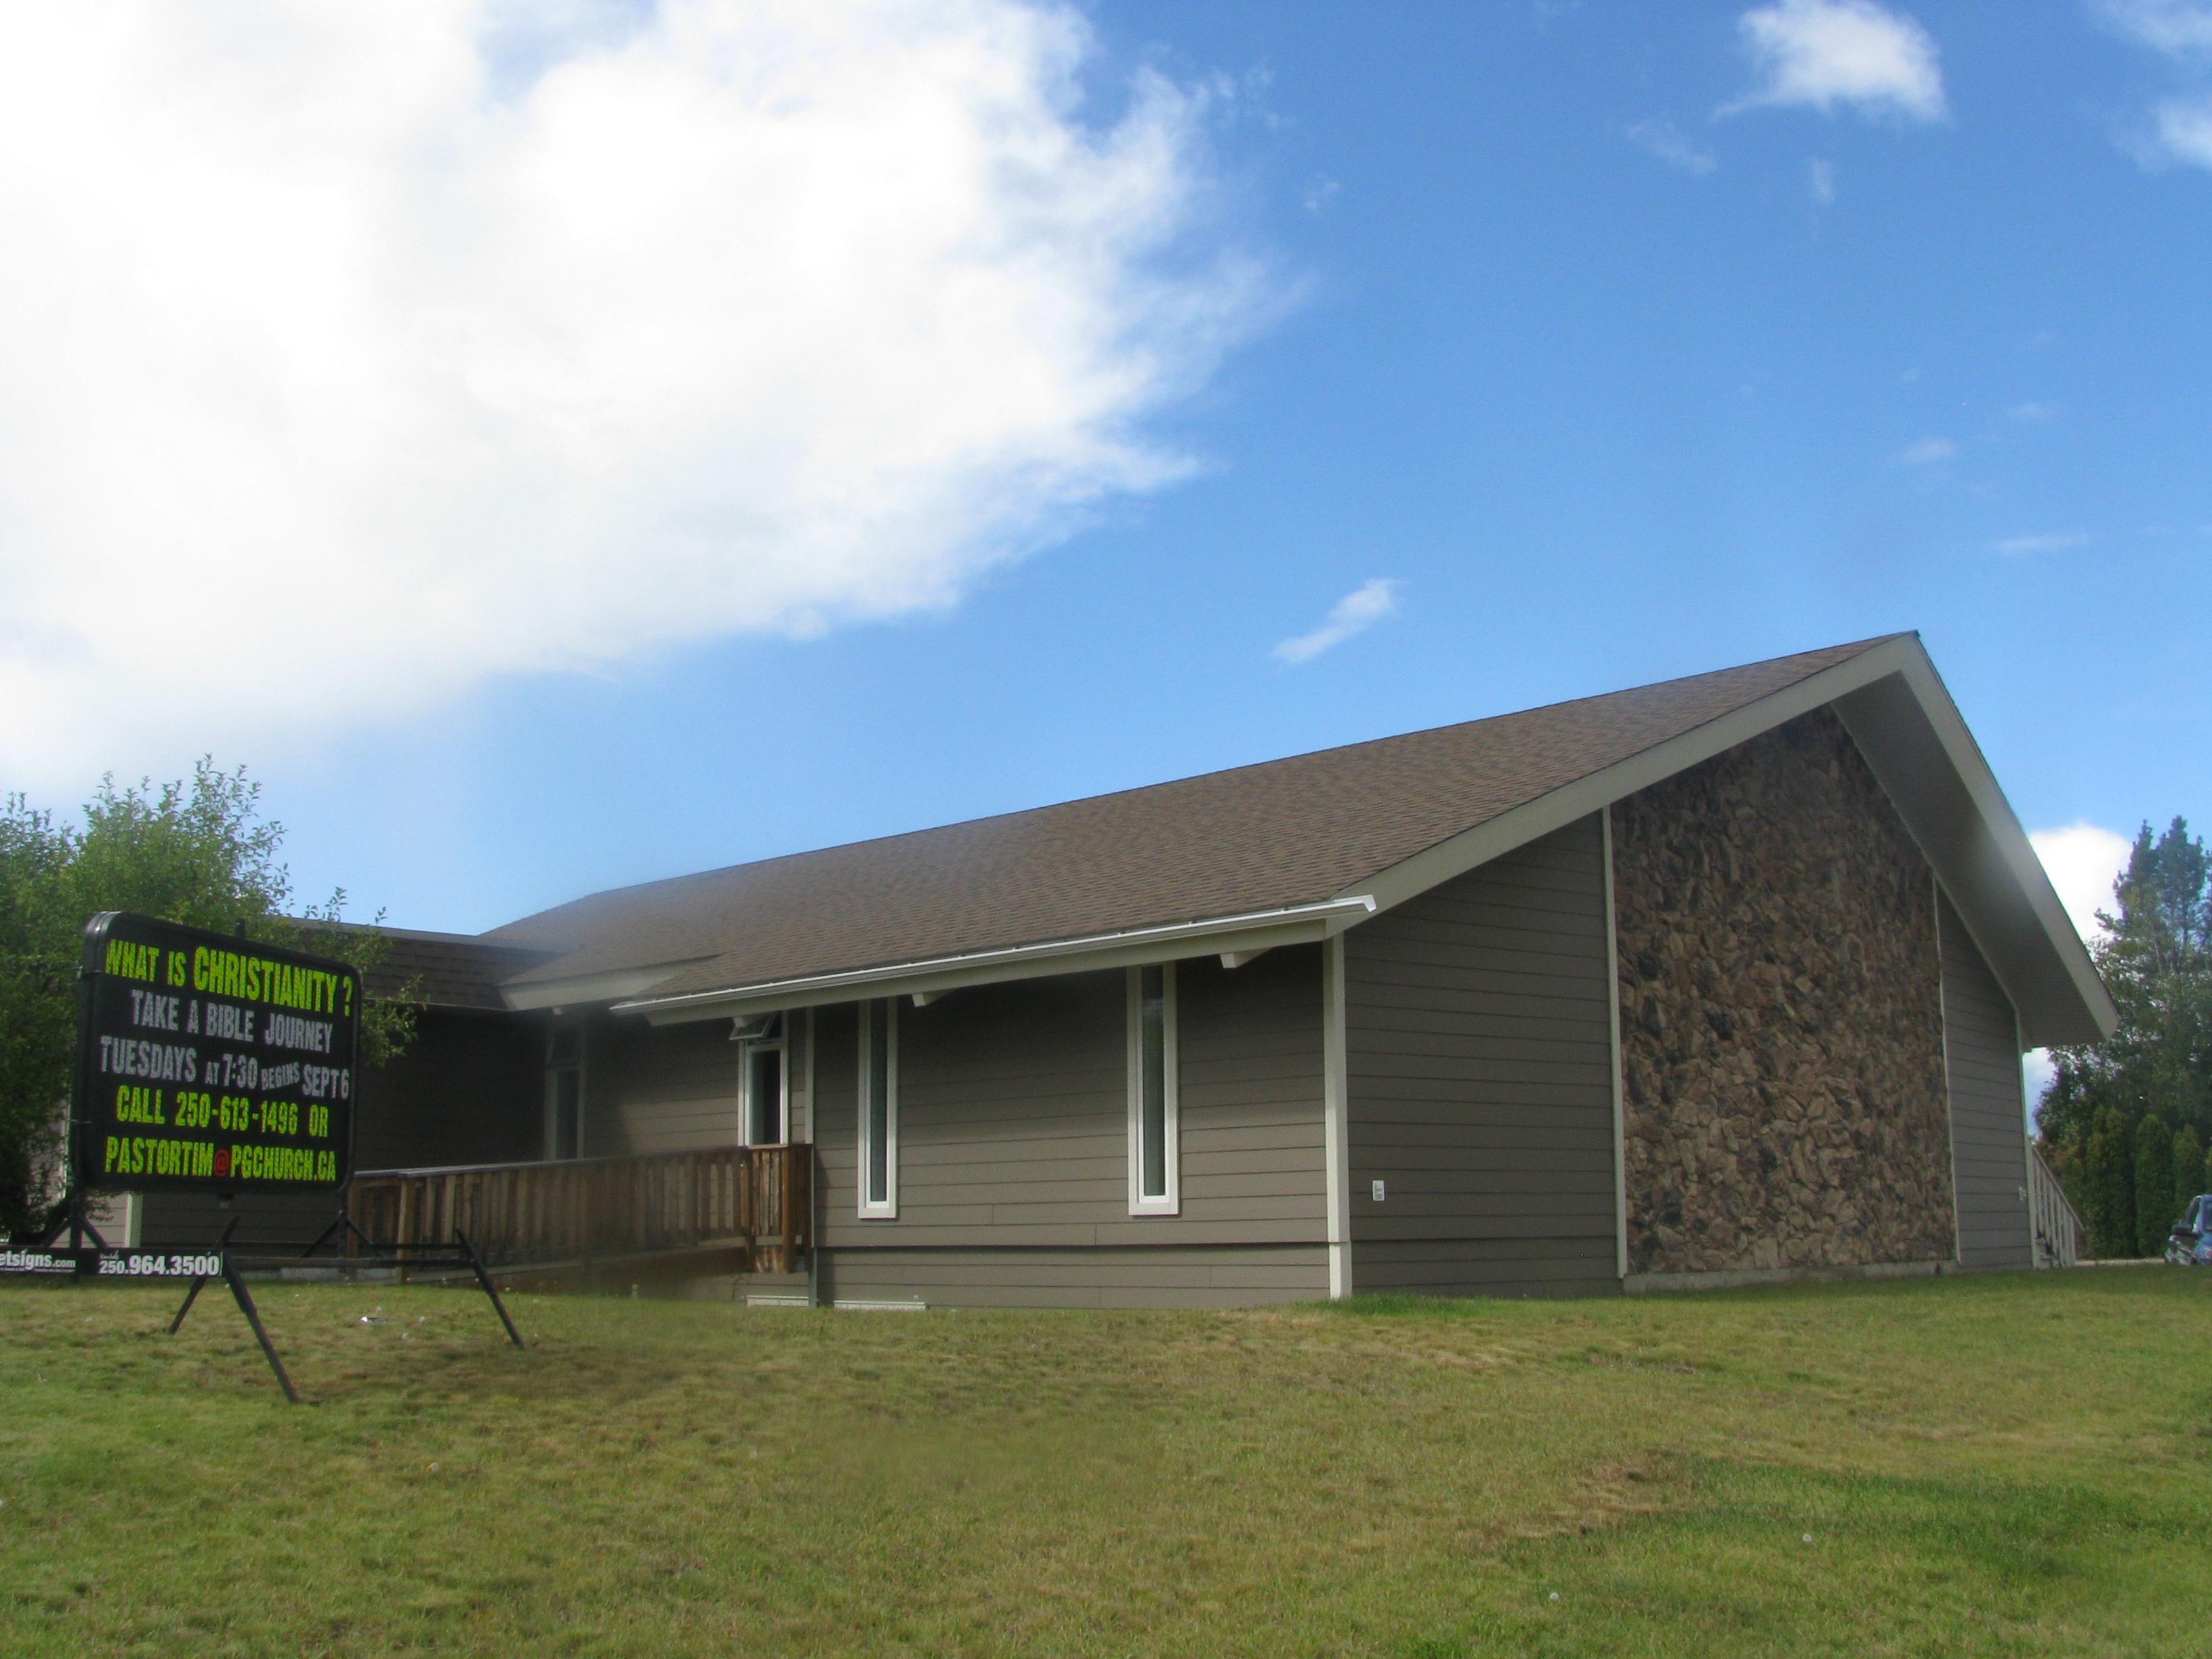 Prince George Canadian Reformed Church logo